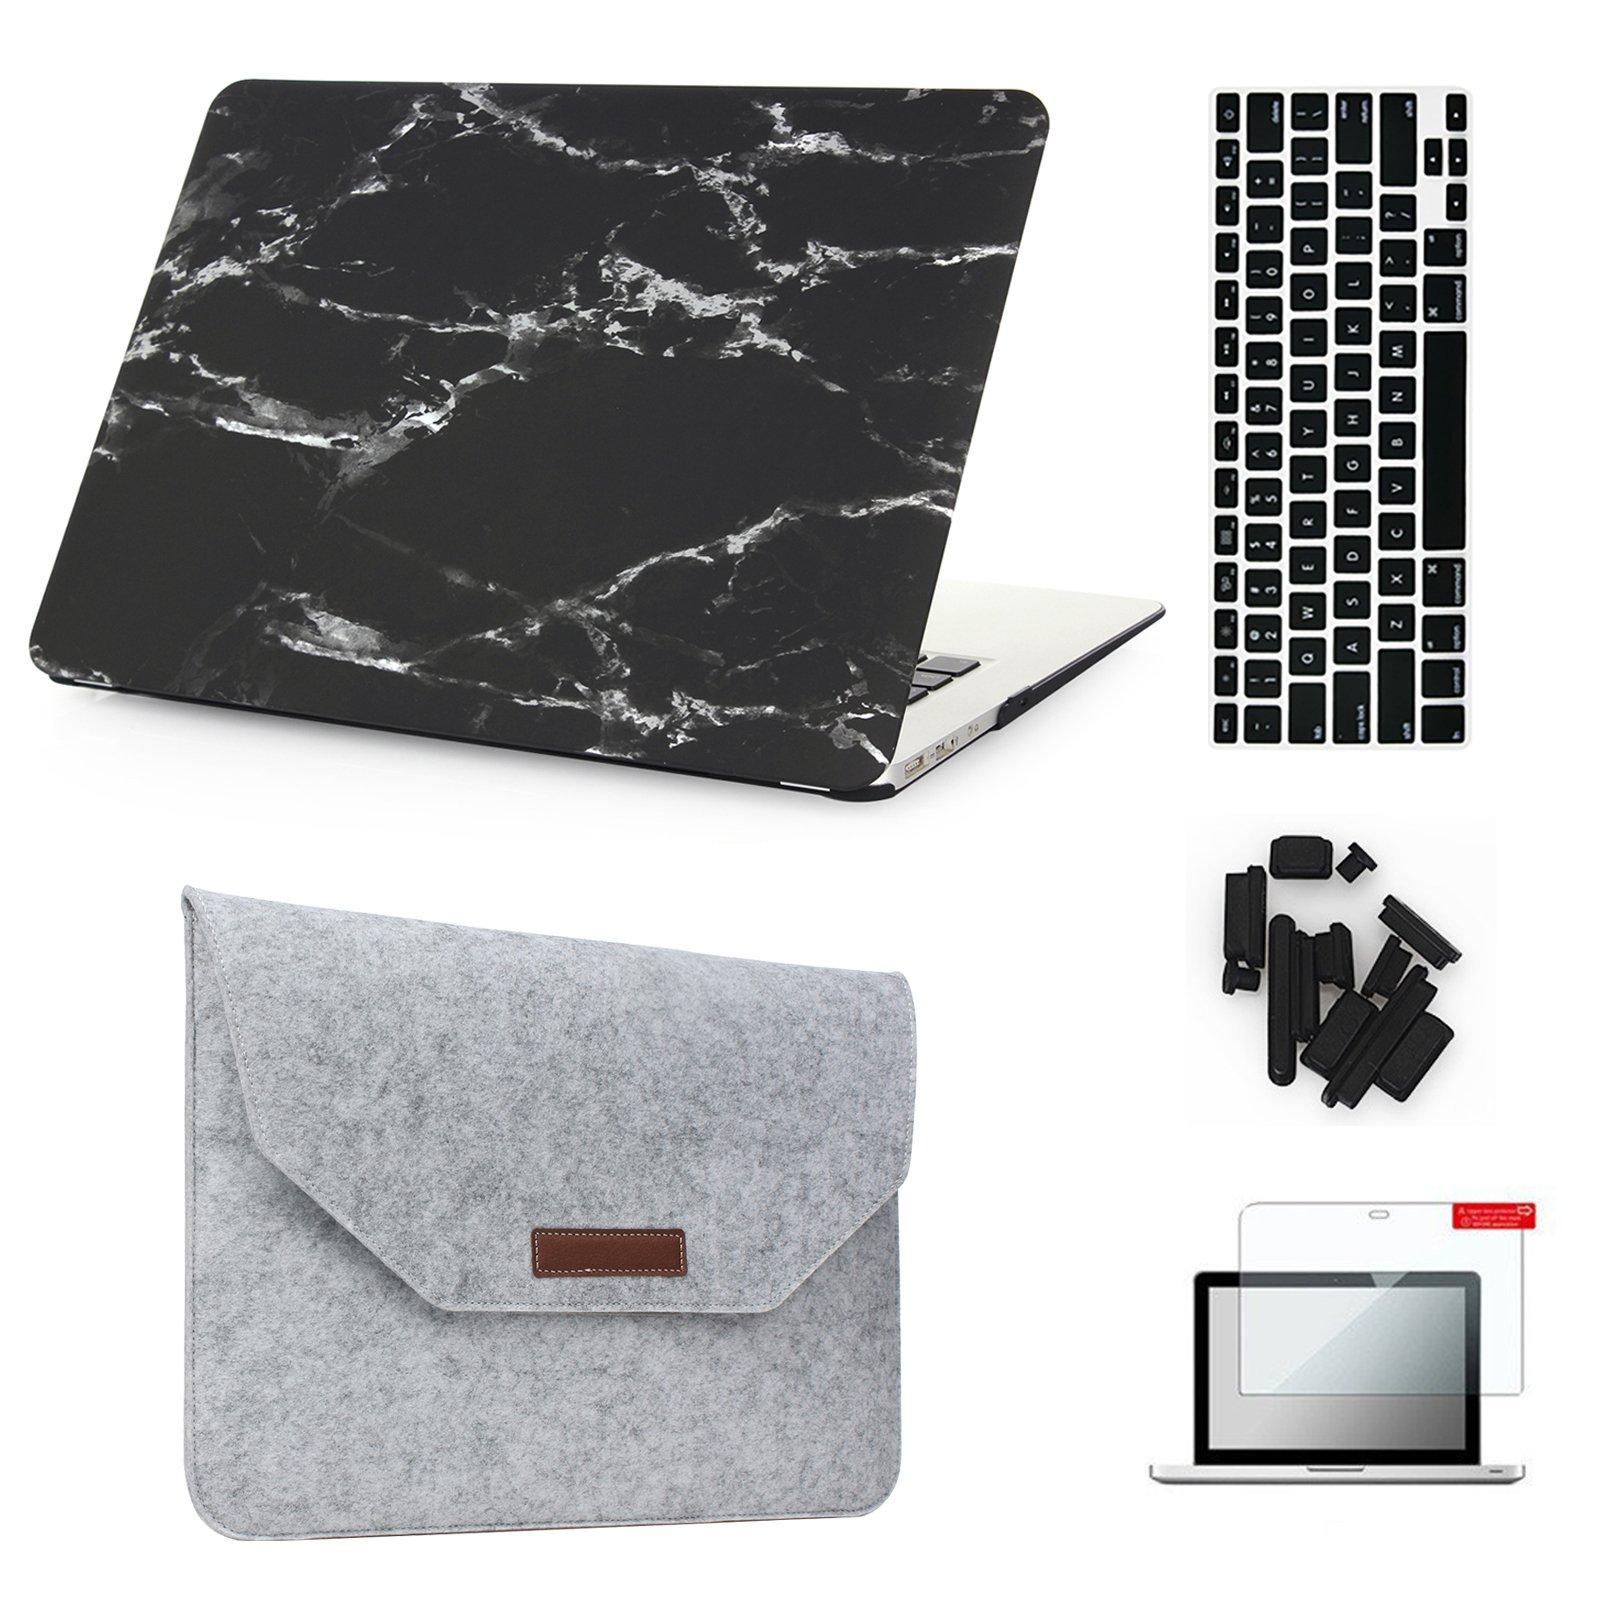 MacBook Air 13'' Case & Sleeve[5 in 1 Bundle], Keyrun Plastic Hardshell Case Bundle with Felt Sleeve, Screen Protector, Keyboard Cover & Dust Plug for MacBook Air 13-inch A1369/A1466 - Black Marble